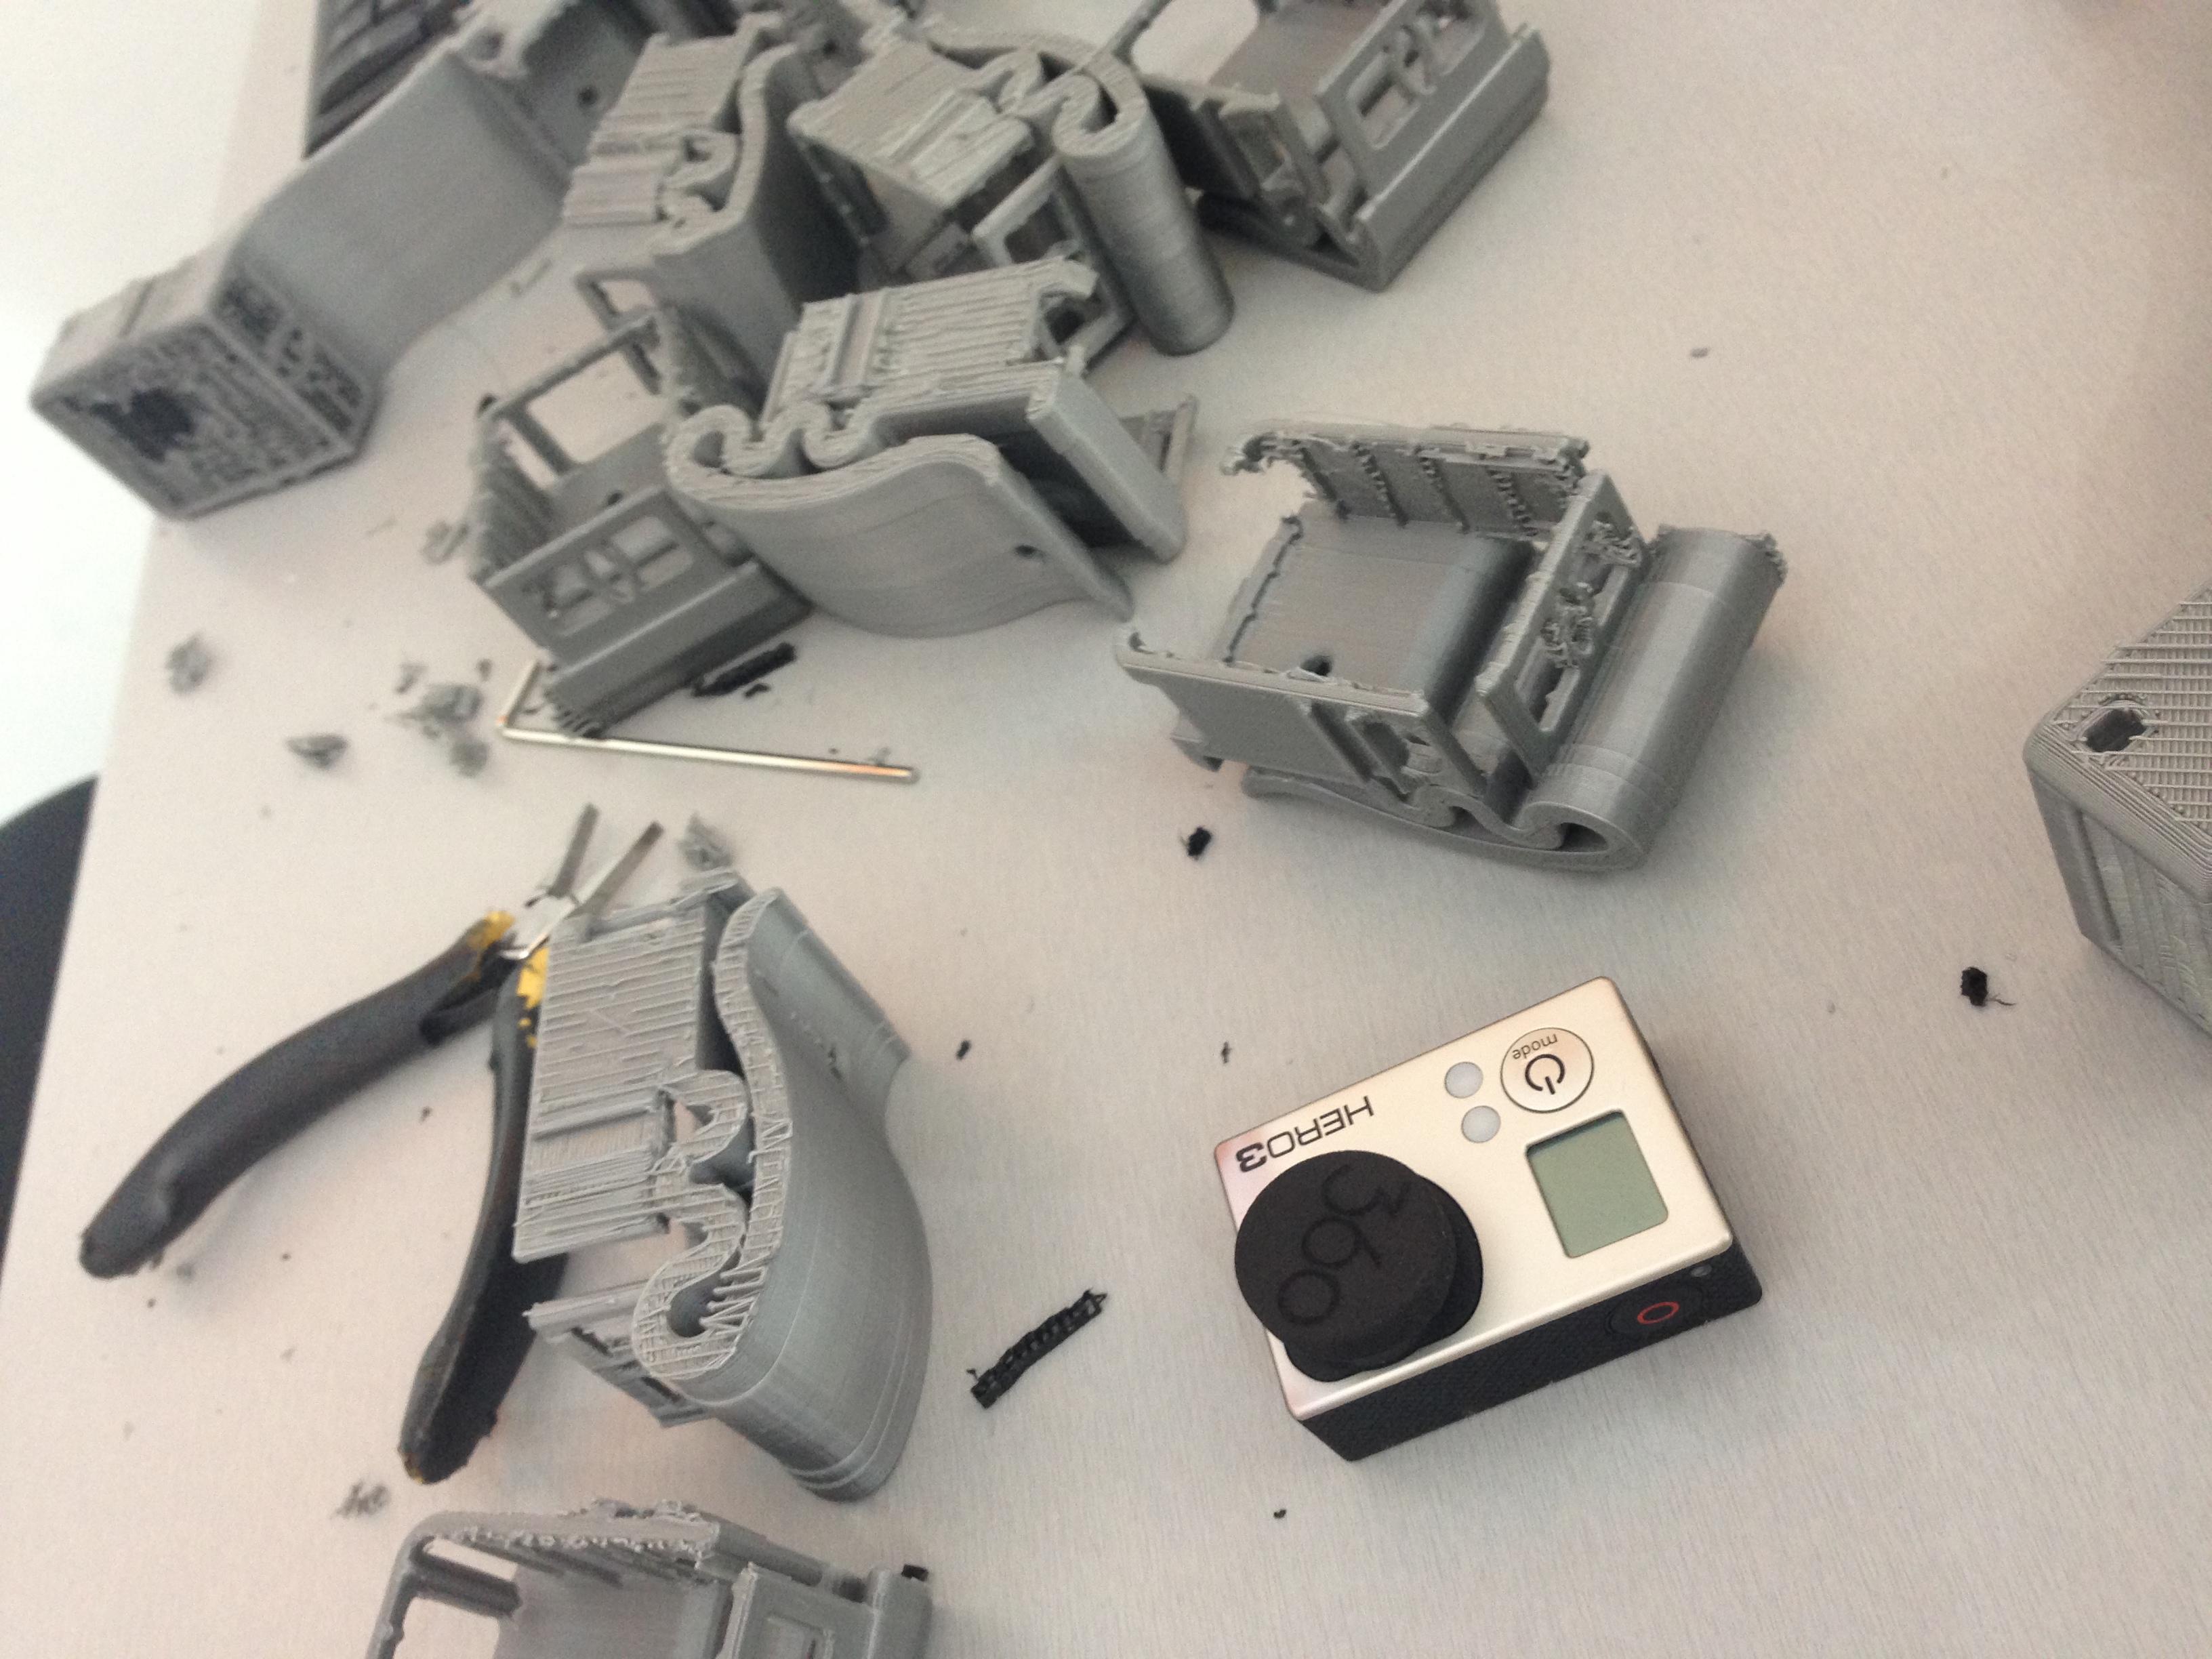 3D printer |360 video